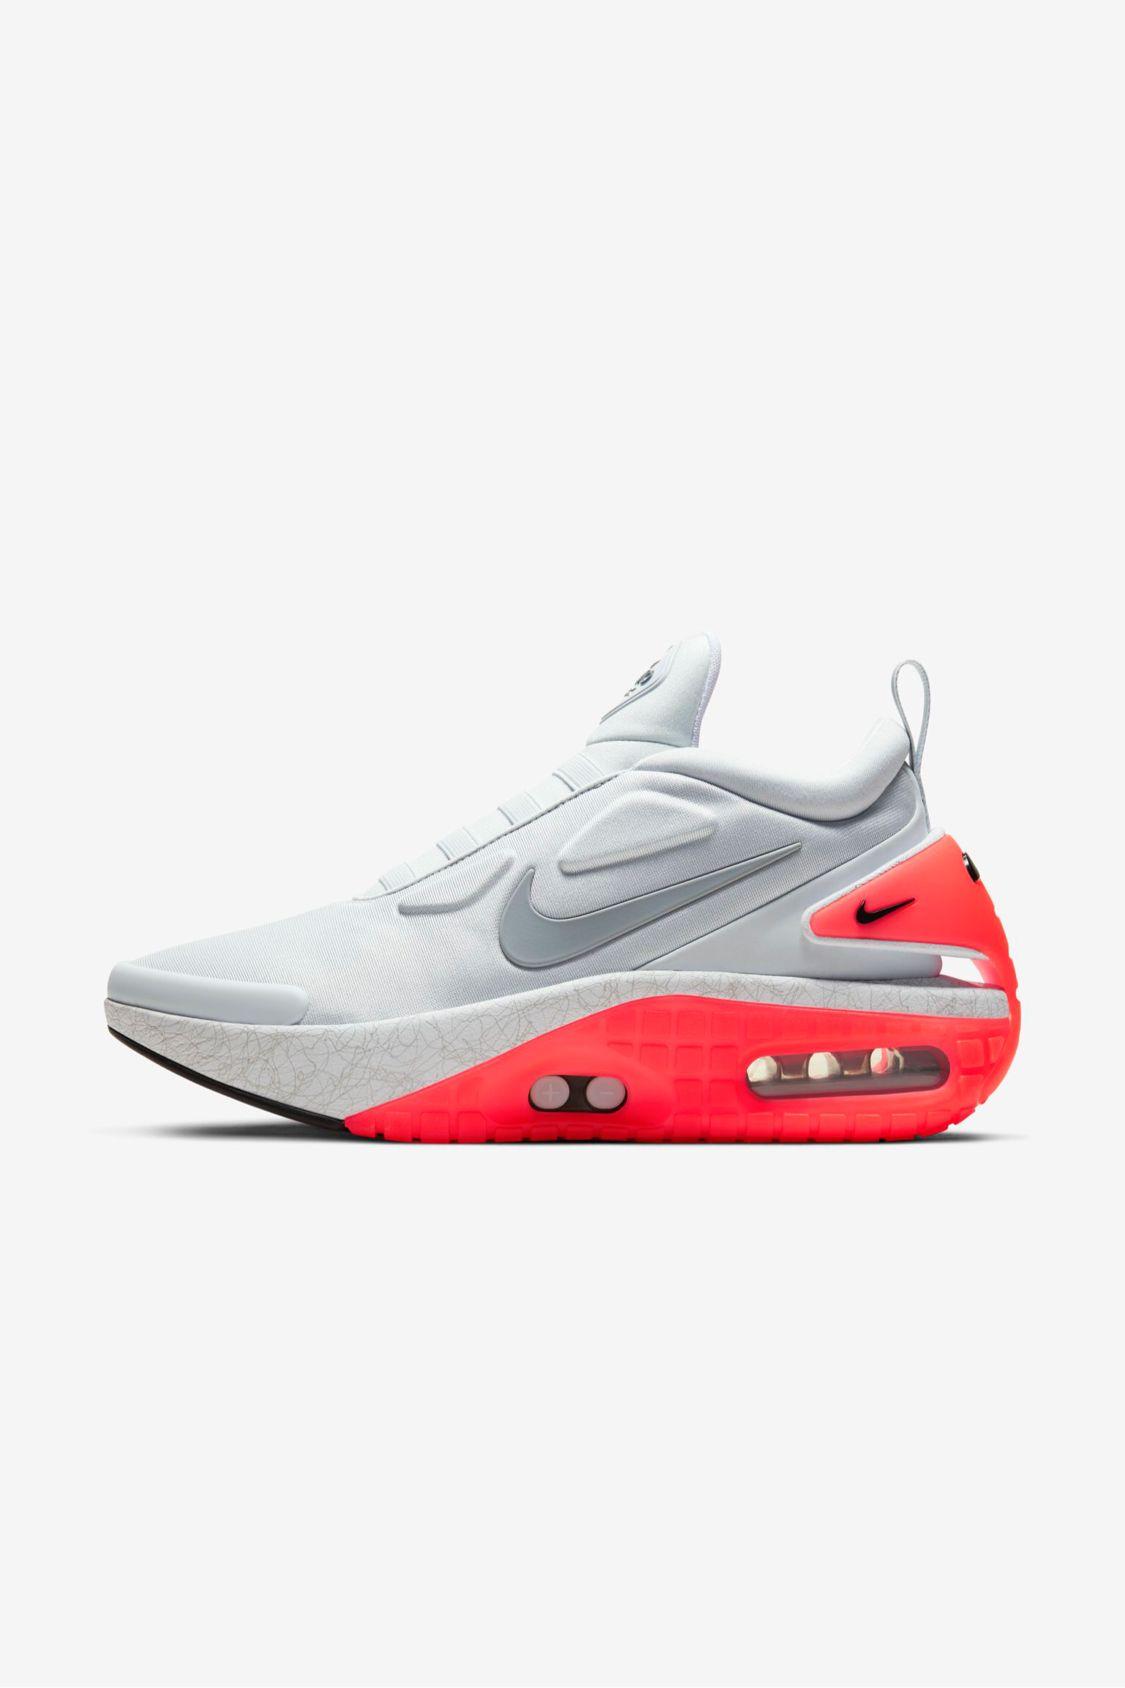 Experto Estado marca  Via Nike SNEAKRS: https://www.nike.com/gb/launch/t/adapt-auto-max-pure-platinum-uk?sitesrc=sneakrsIosShare  in 2020 | Sneakers men fashion, Nike snkrs, Sneakers